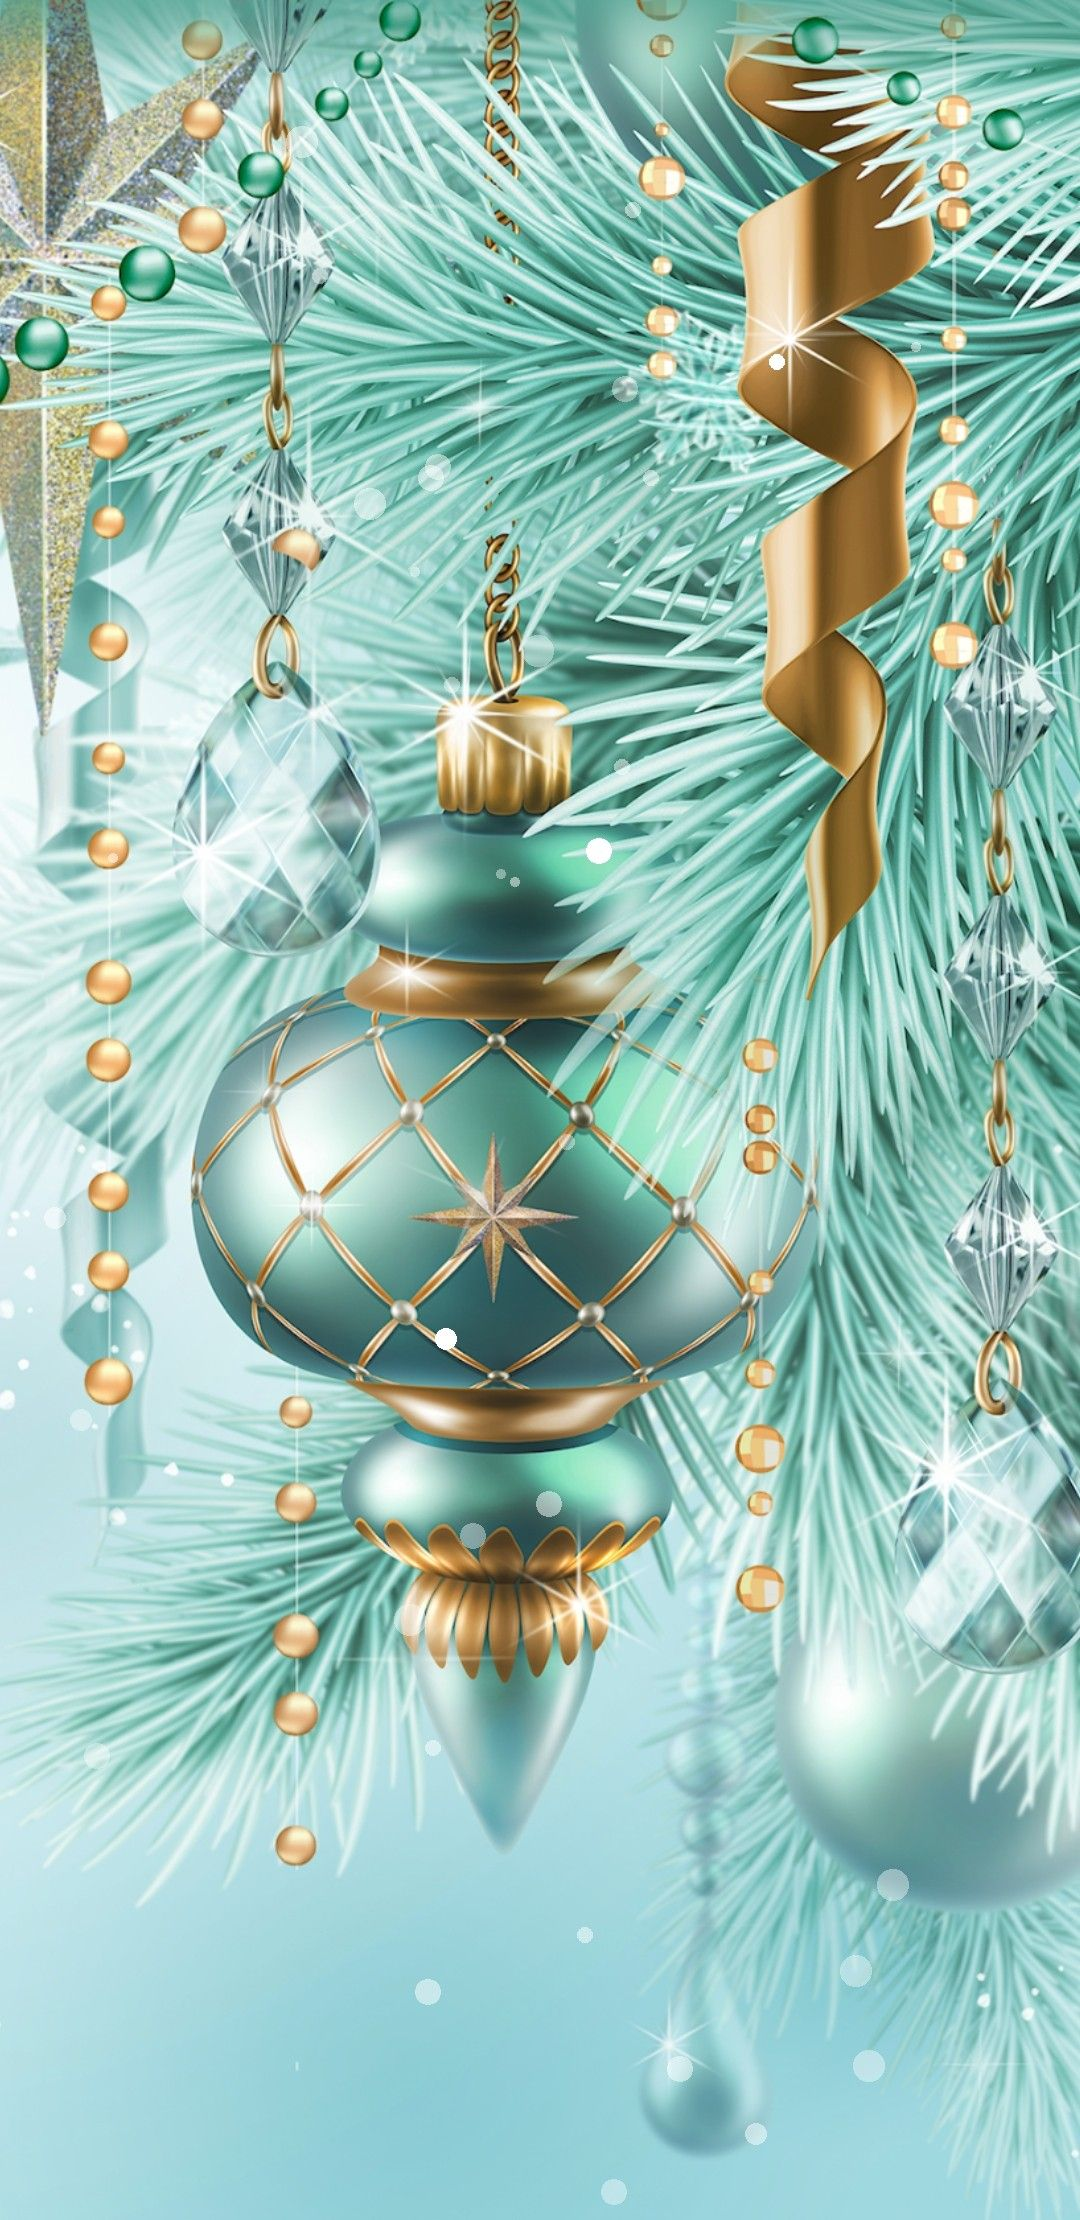 Vintage 1940s Christmas ornaments Christmas tree